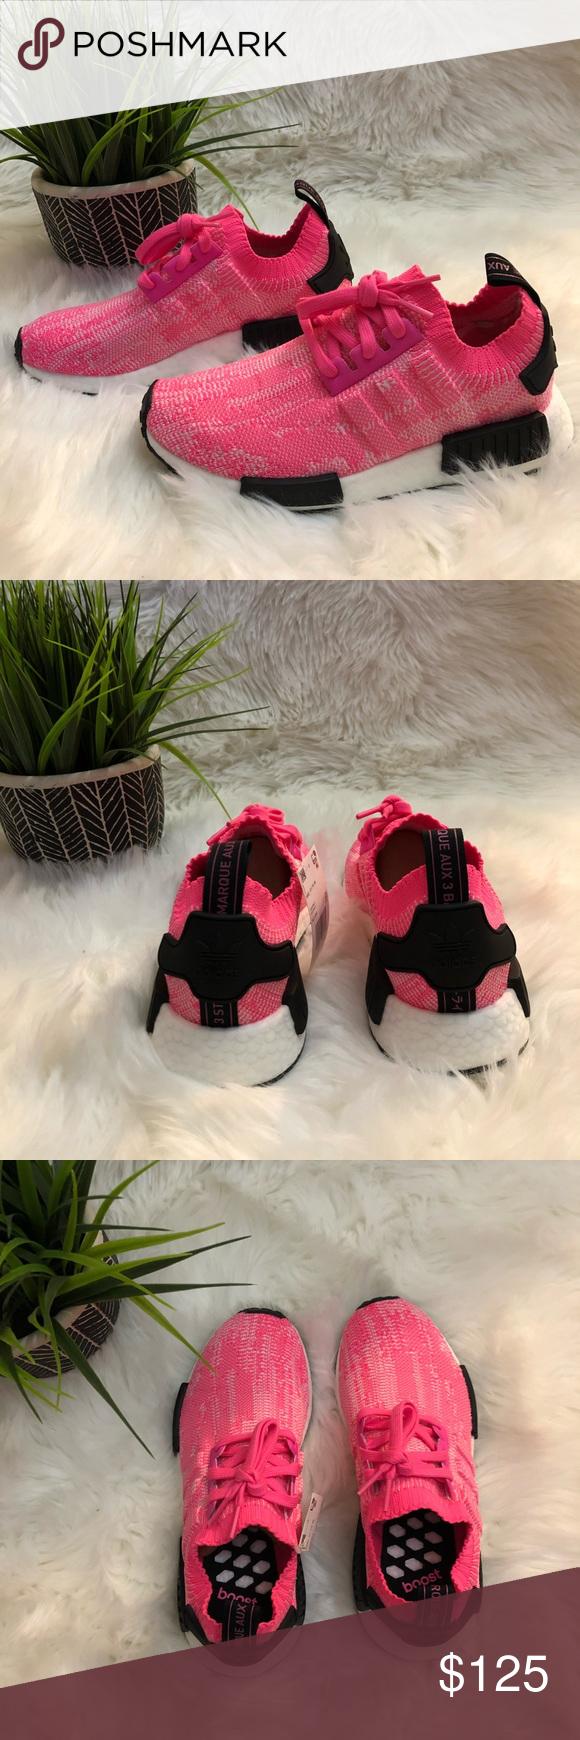 947e444a8b168 Adidas NMD R1 Primeknit Sneakers 7 NIB Brand new in box Adidas NMD R1 Primeknit  Sneakers. Women s size 7. Solar Pink  Solar Pink  Core Black. AQ1104 adidas  ...